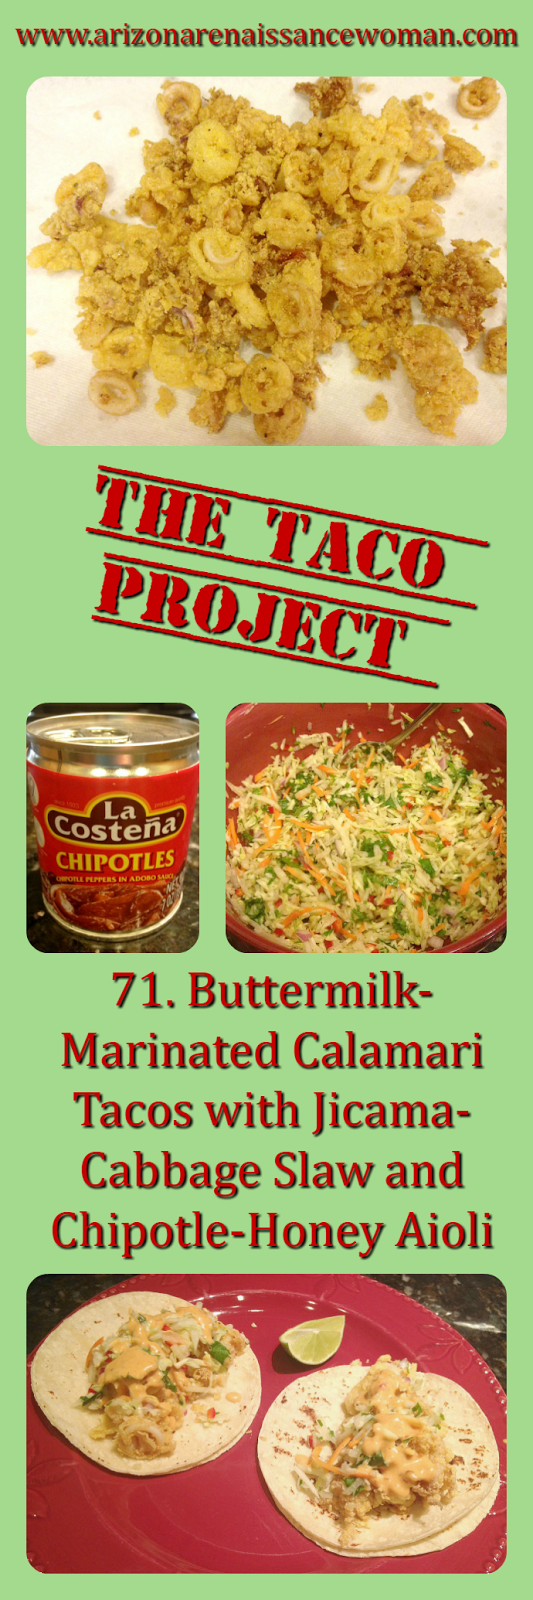 Buttermilk-Marinated Calamari Tacos with Jicama-Cabbage Slaw and Chipotle-Honey Aioli Collage